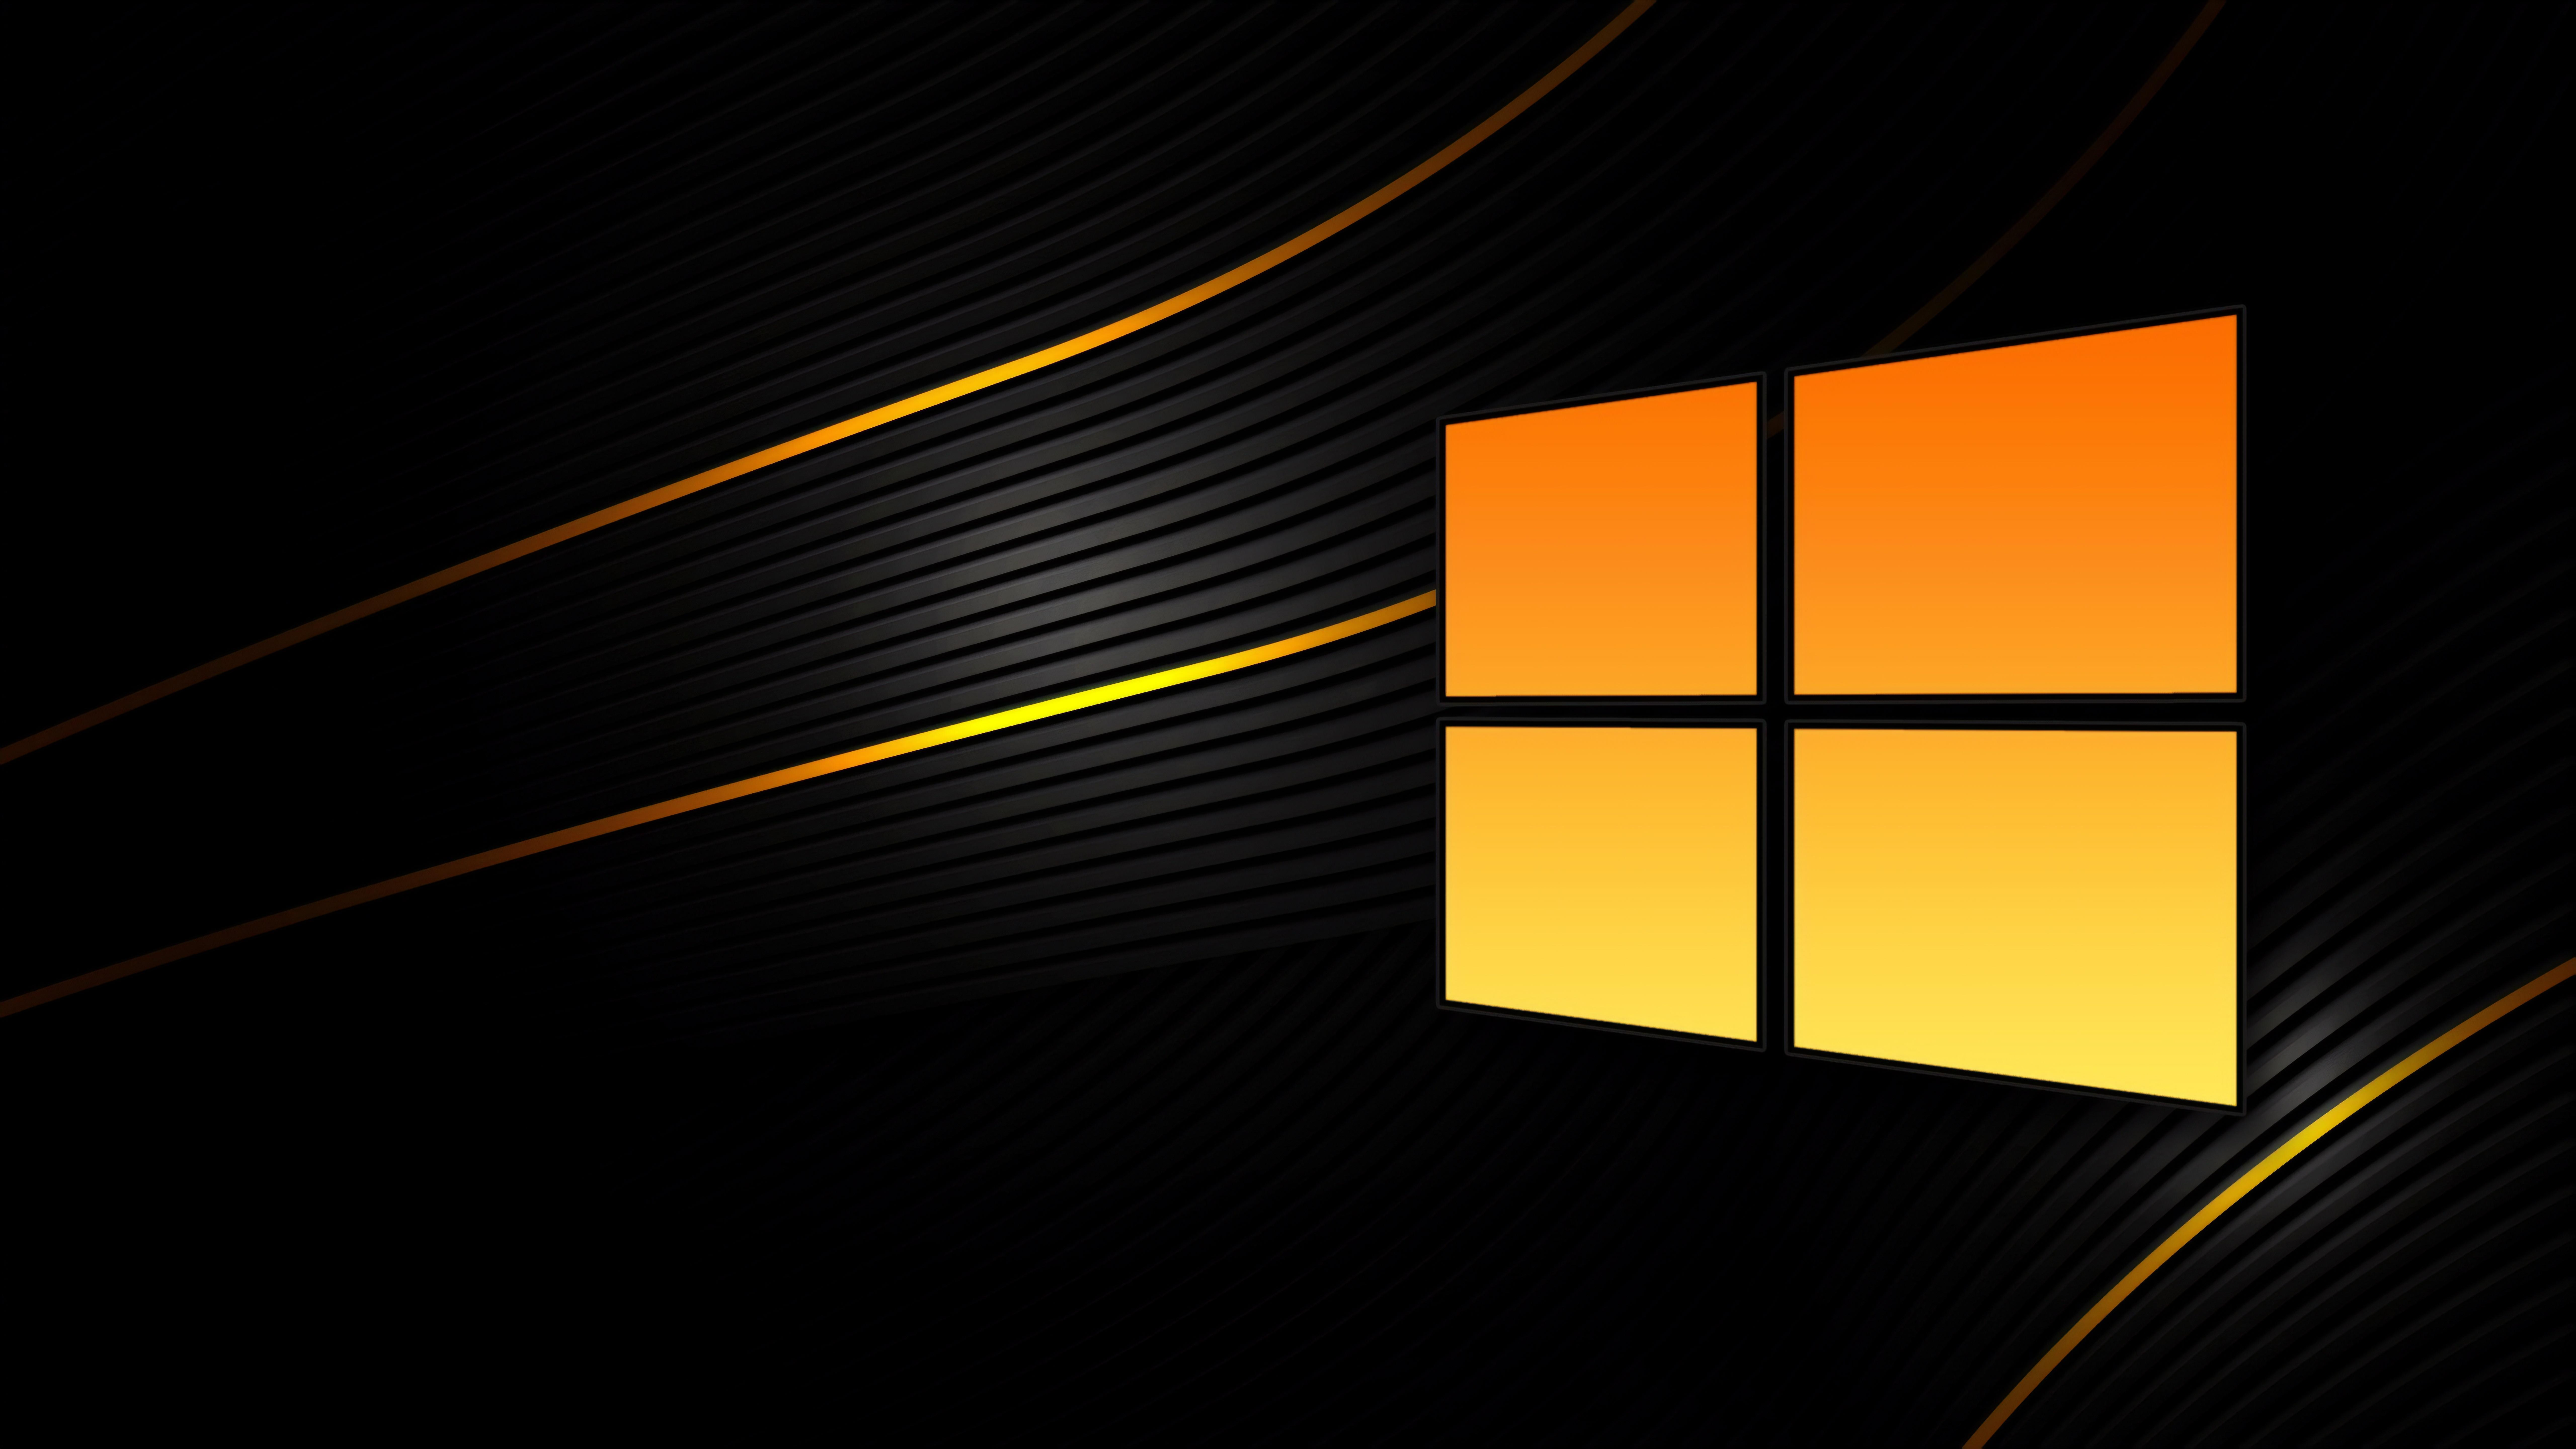 Windows 10 Wallpaper 8k Ultra Fondo De Pantalla Hd Fondo